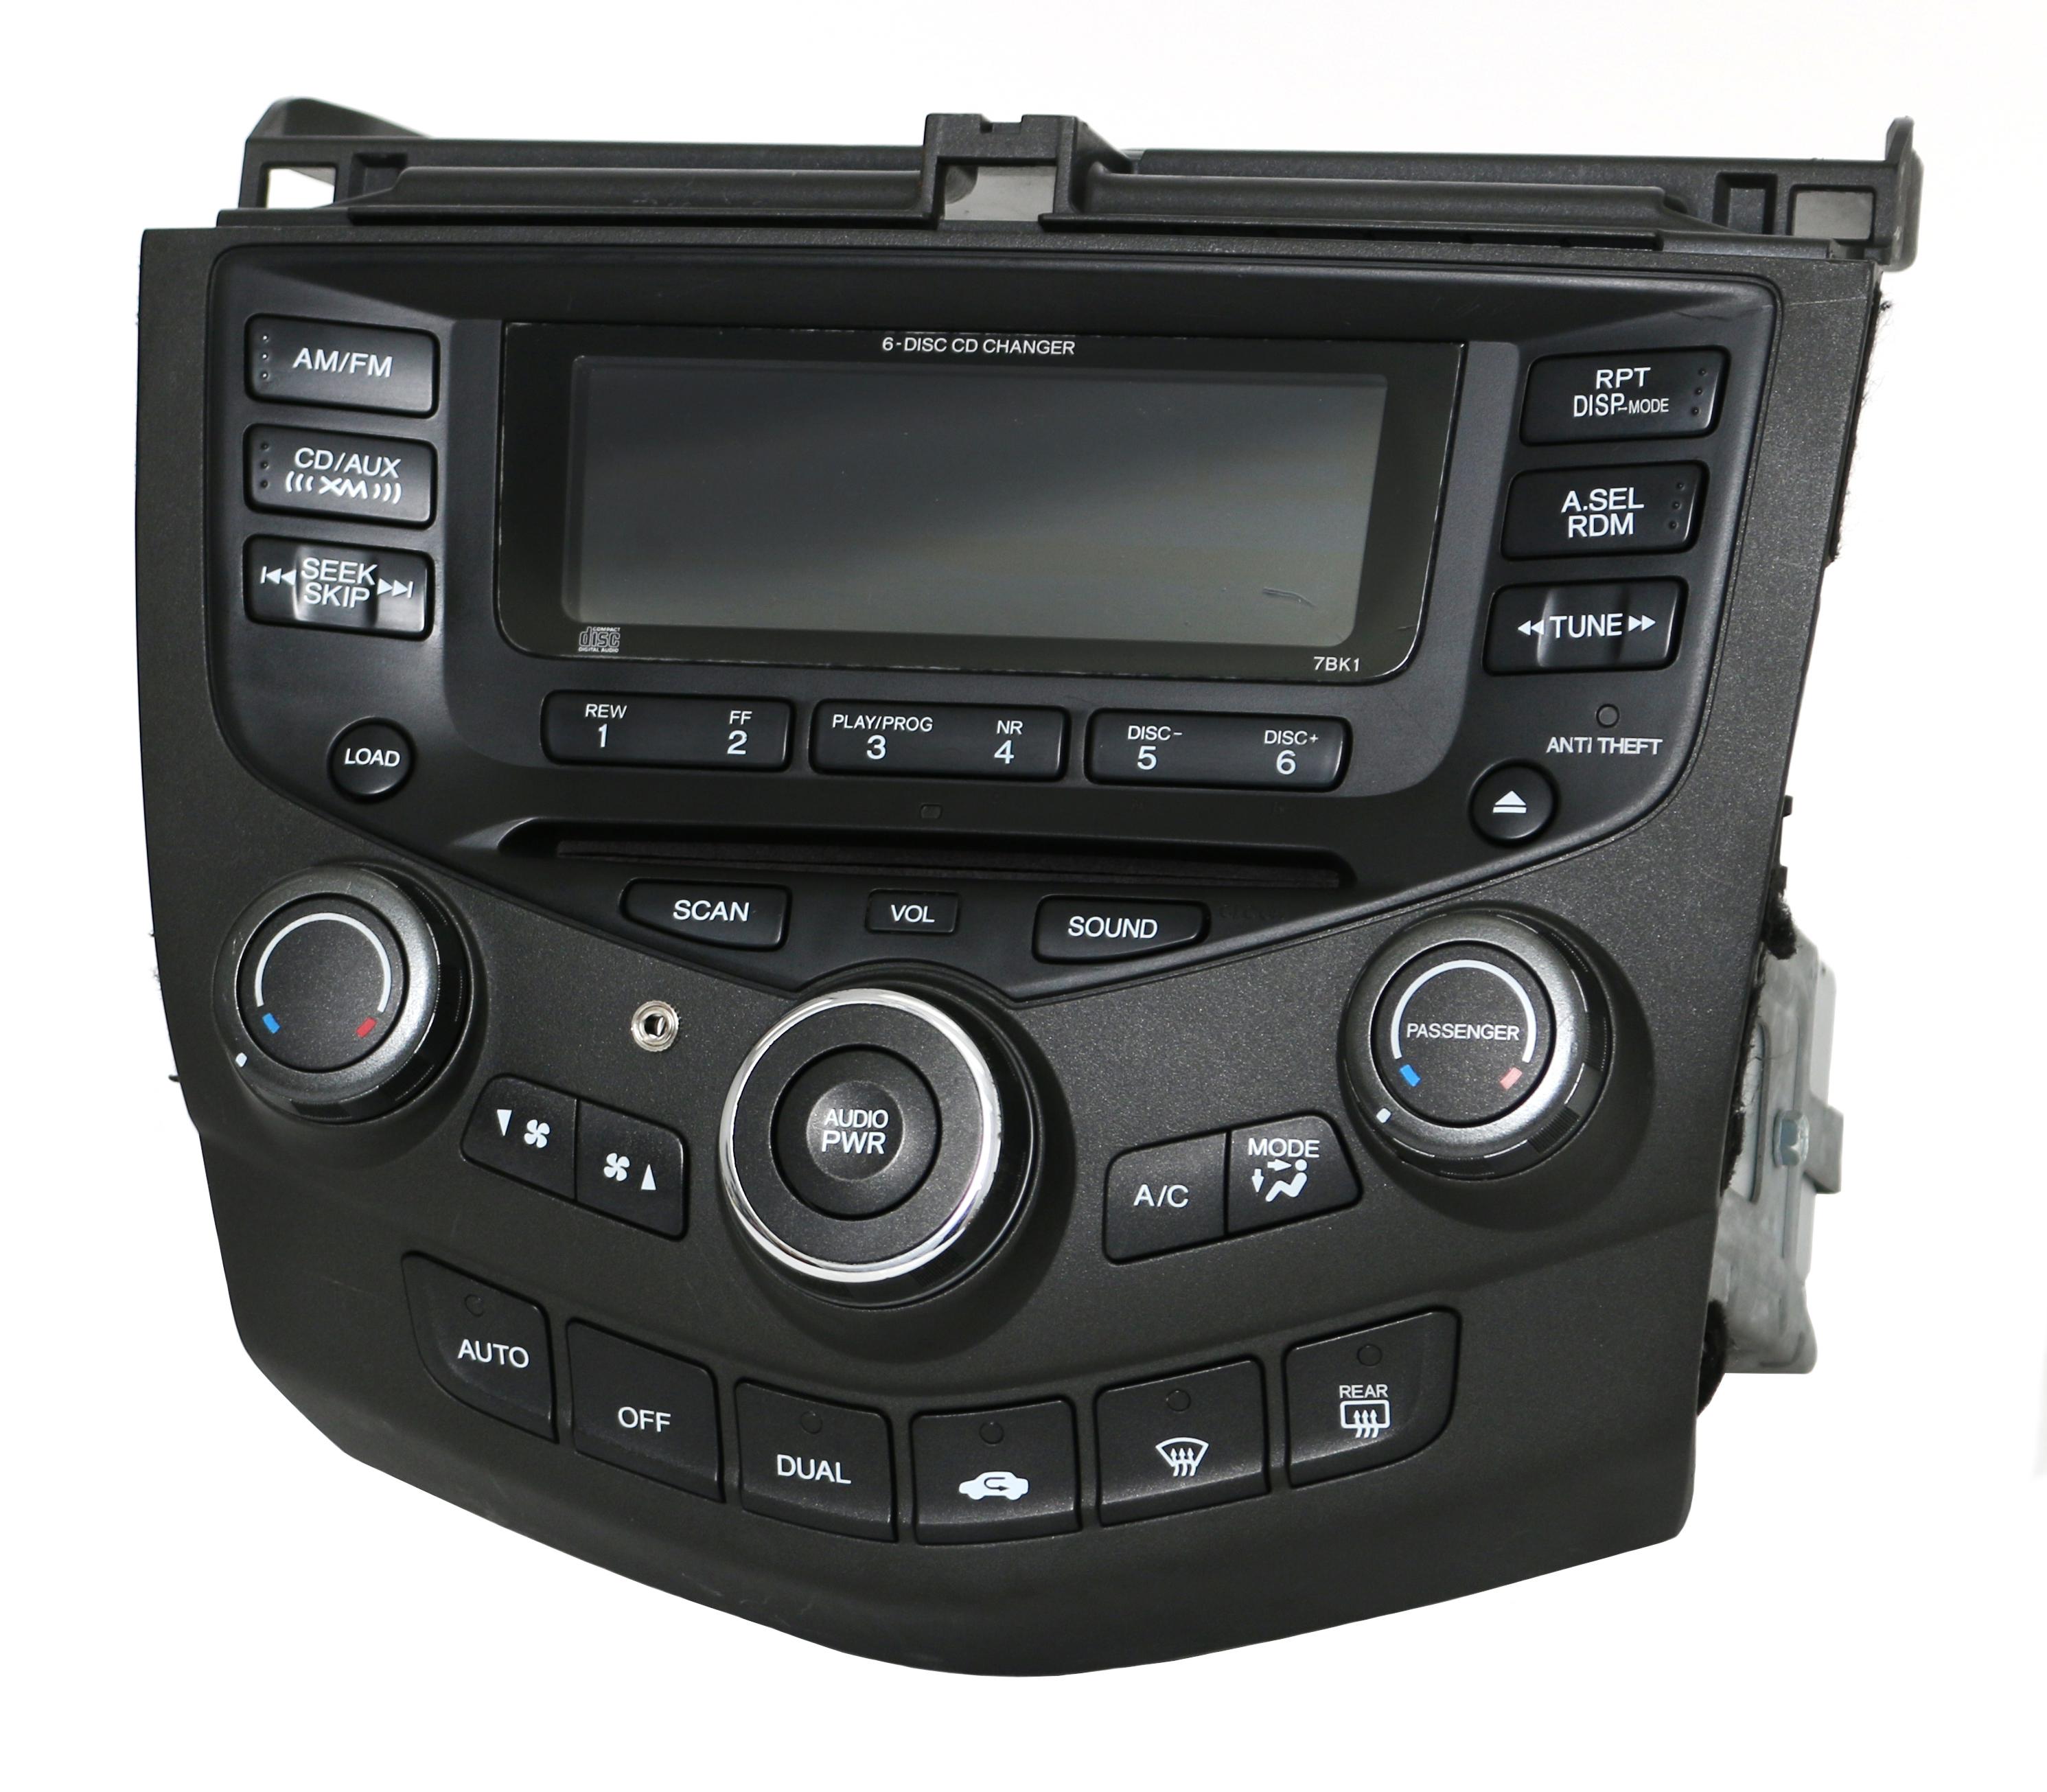 04-07 Honda Accord Radio AMFM 6 CD Temp Ctrls w Aux Input 39175-SDA-L110-M2  7BK1 - 1 Factory Radio